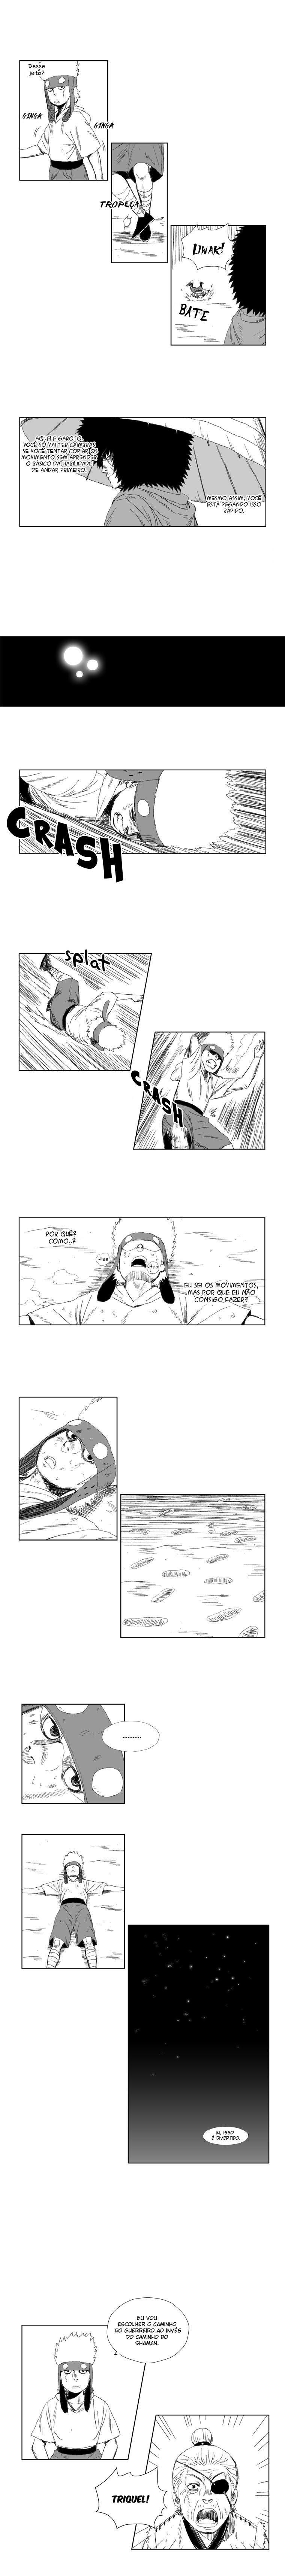 https://nine.mangadogs.com/br_manga/pic/29/1501/616314/RedStorm023984.jpg Page 6